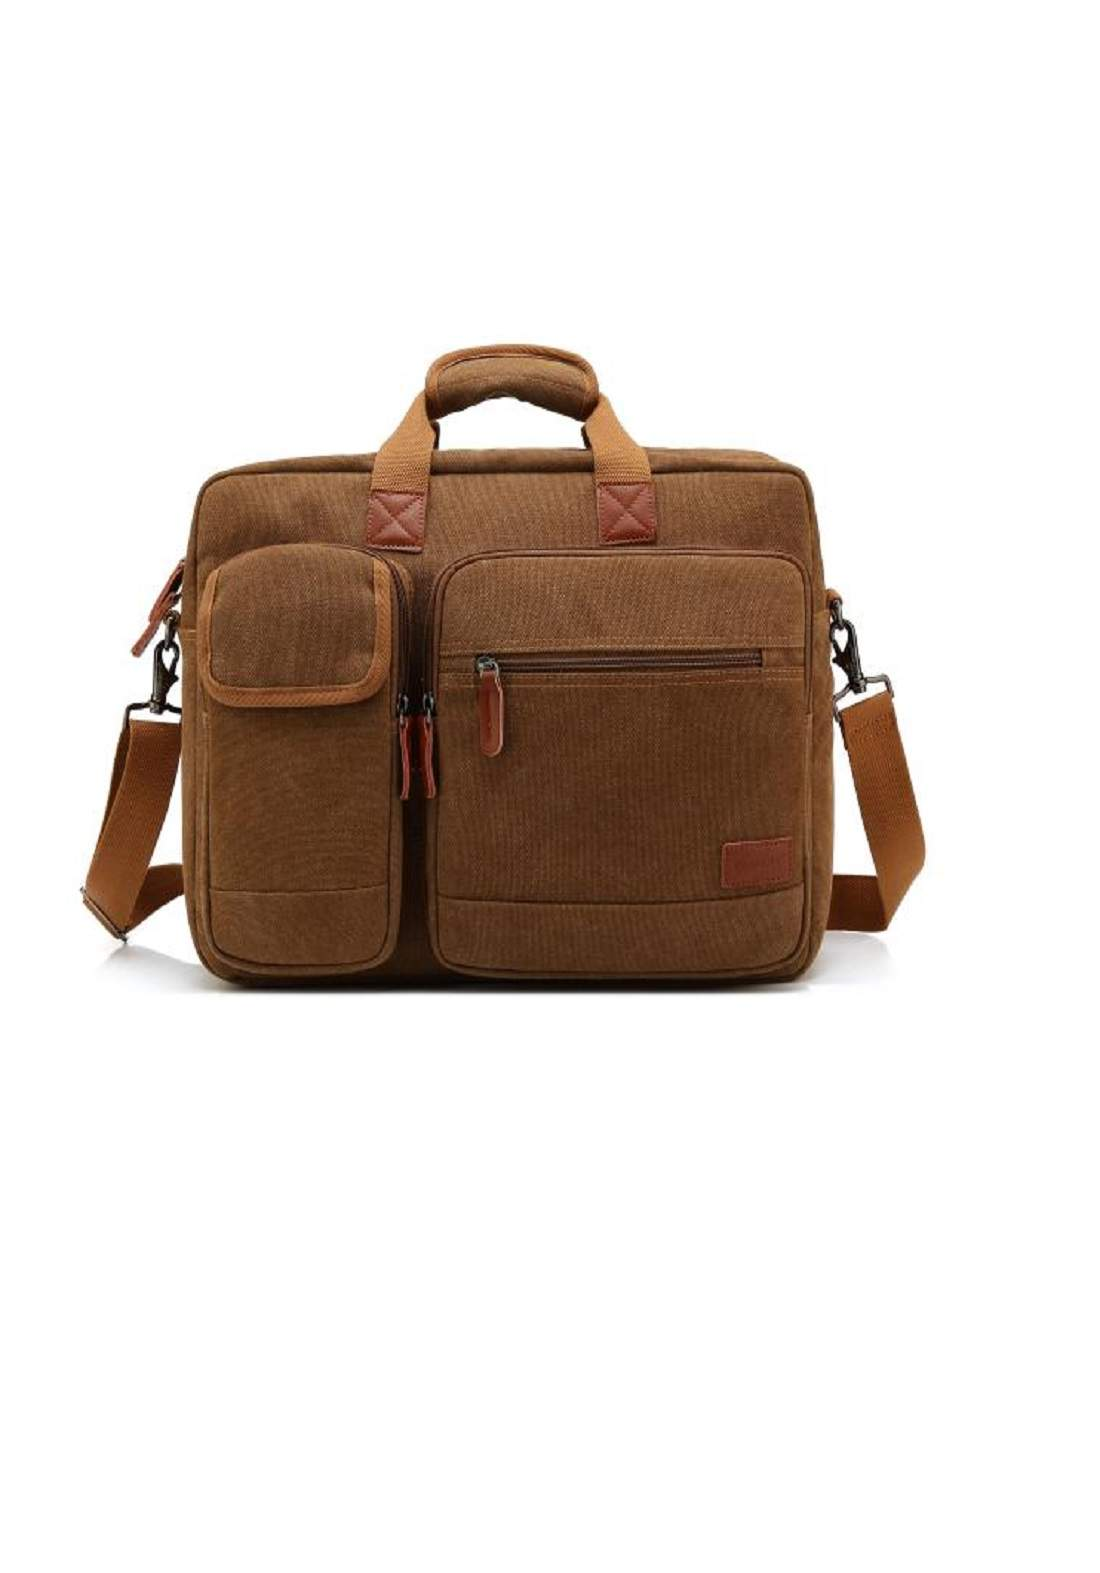 CollBell CB-5002 Laptop Bag-Brown حقيبة لابتوب